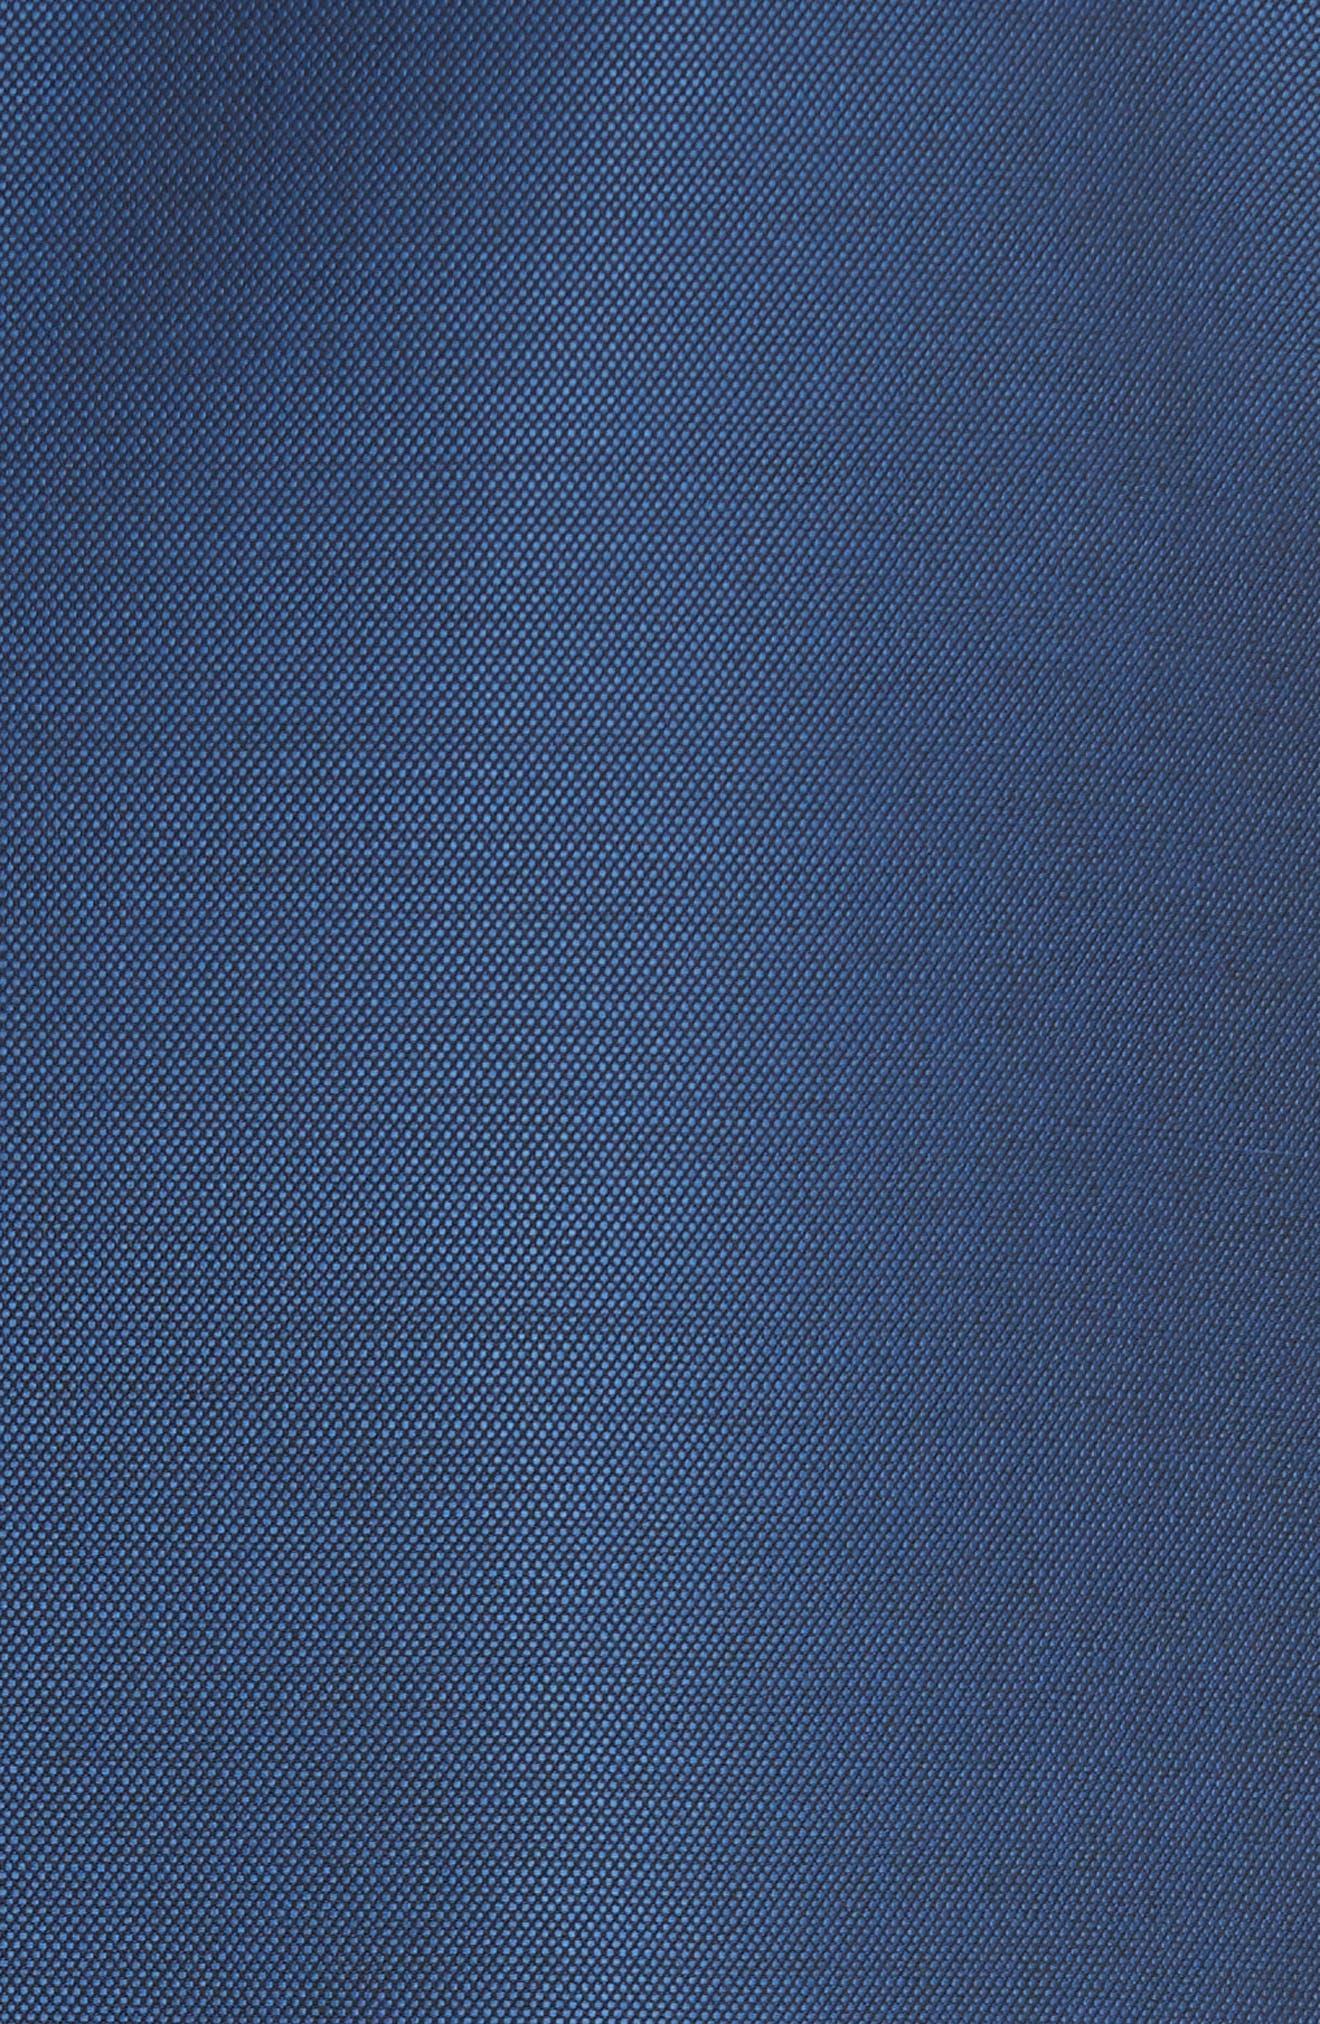 Classic Fit Solid Wool Suit,                             Alternate thumbnail 7, color,                             Blue